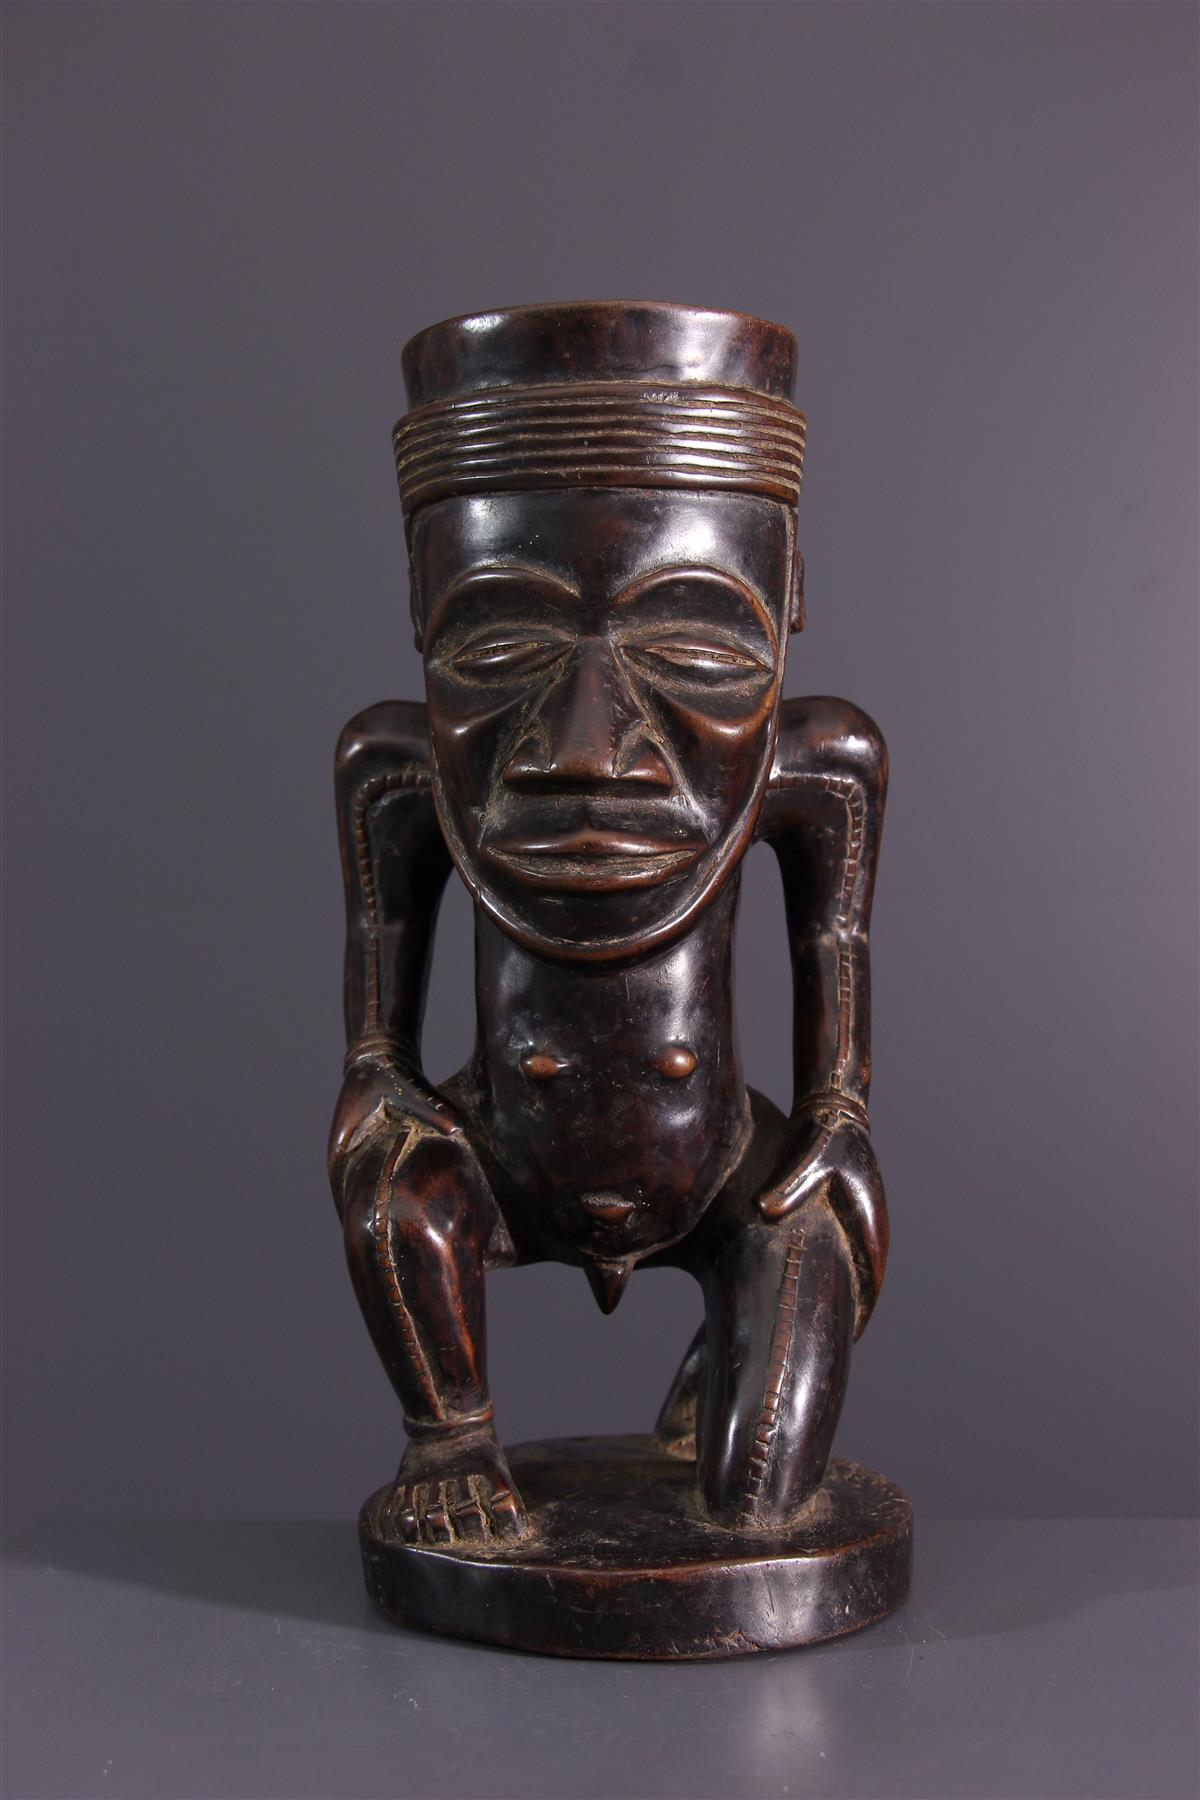 Ngeende Cup - African art